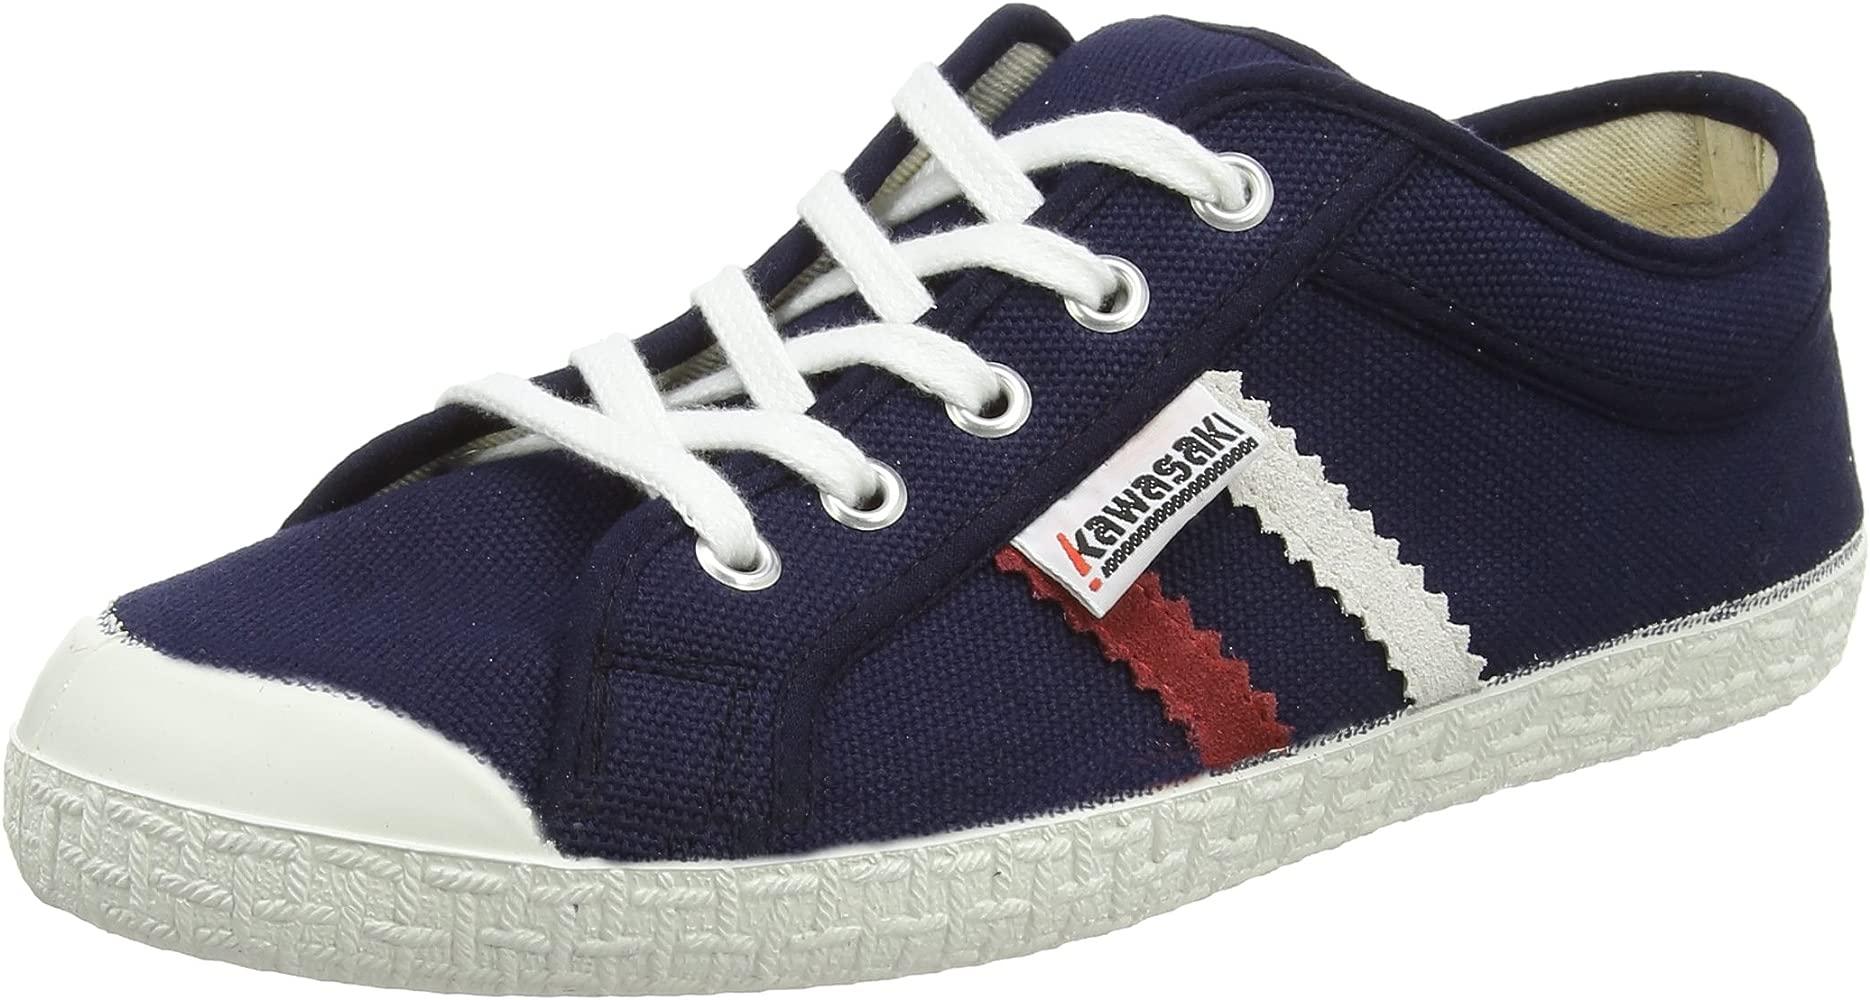 Kawasaki Tennis - Zapatillas de Deporte, Unisex